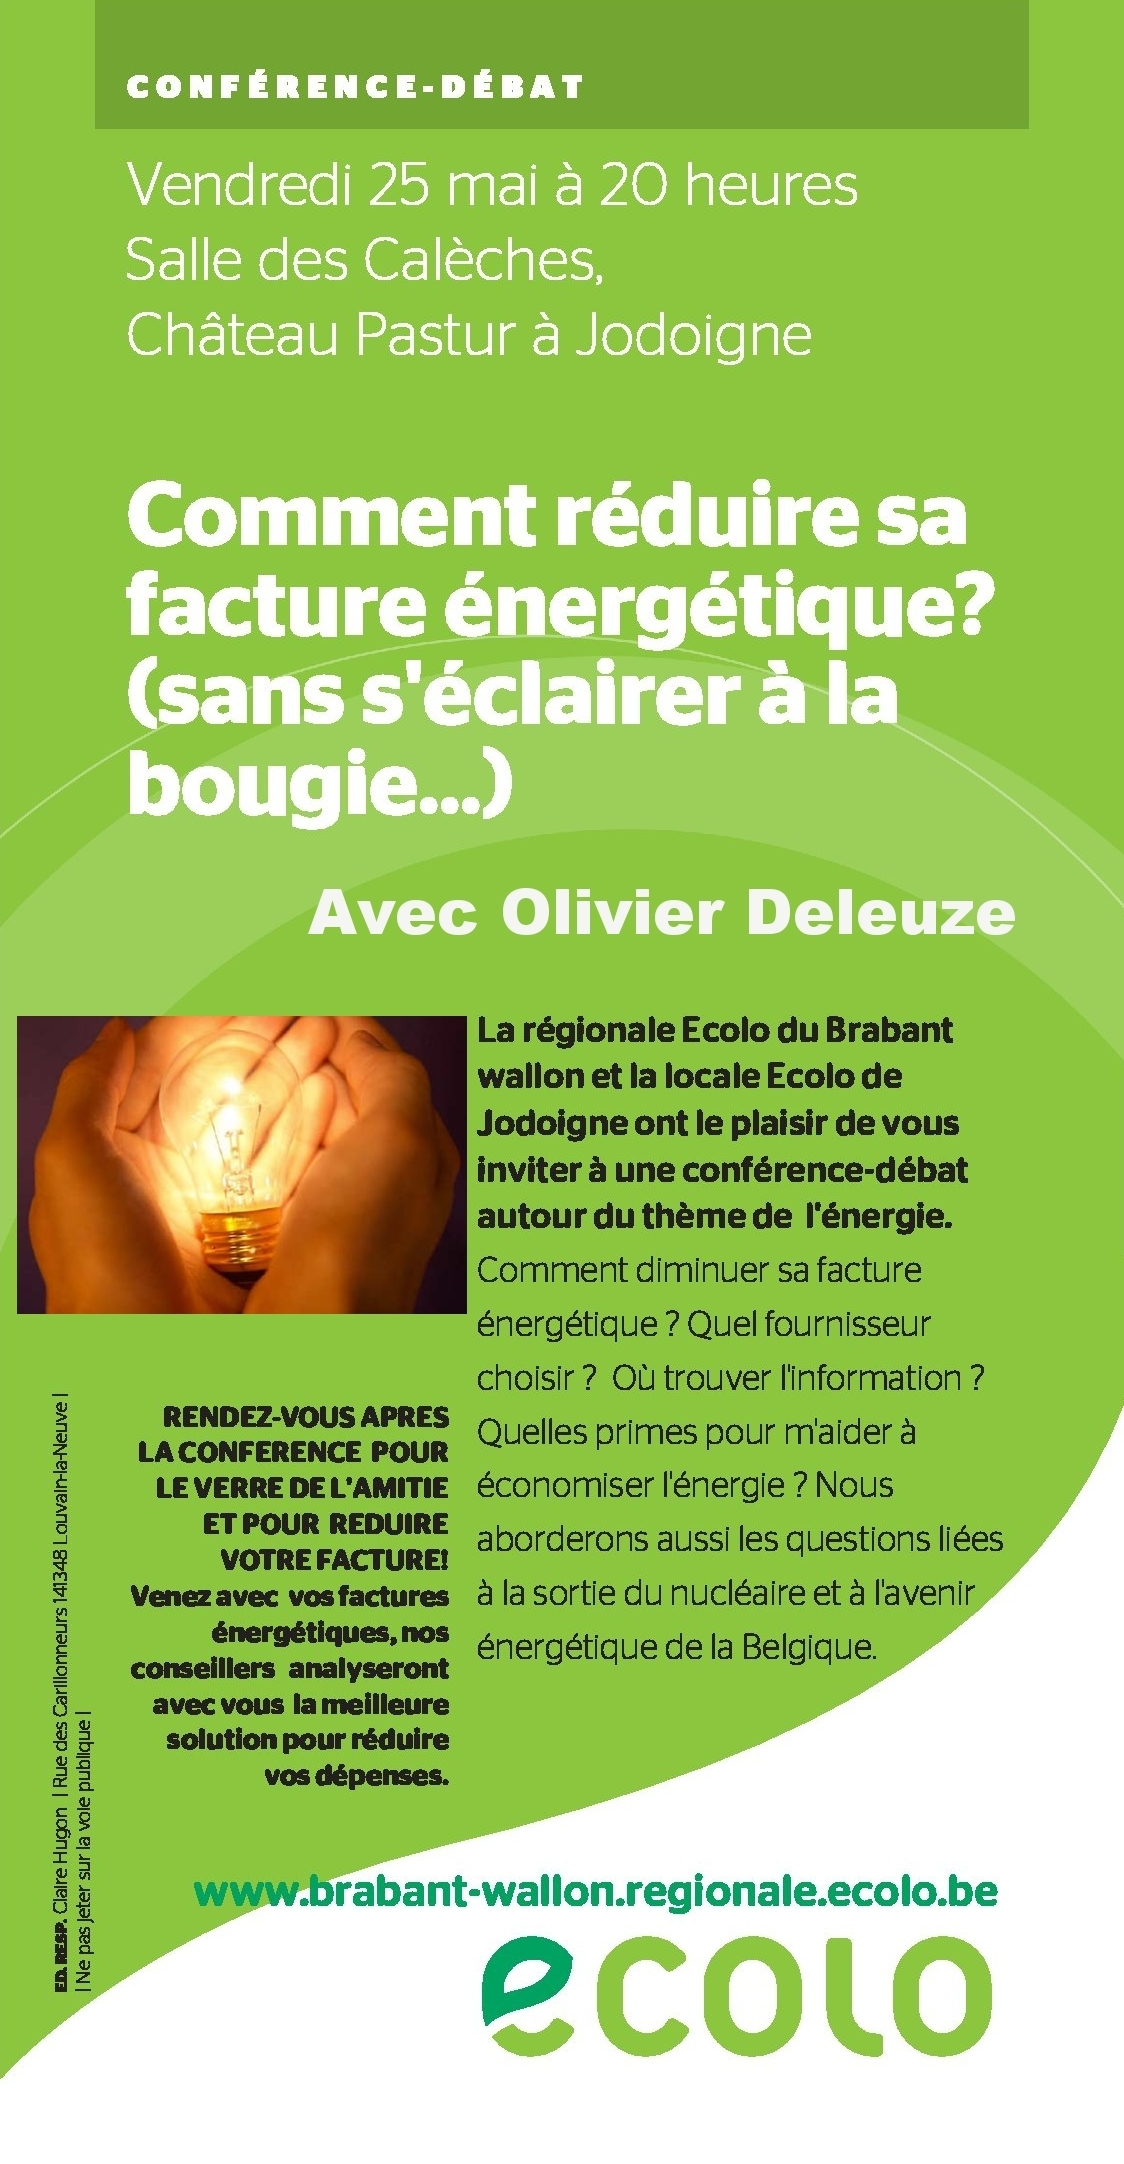 Conference_energie_Olivier_Deleuze_Jodoigne.jpg